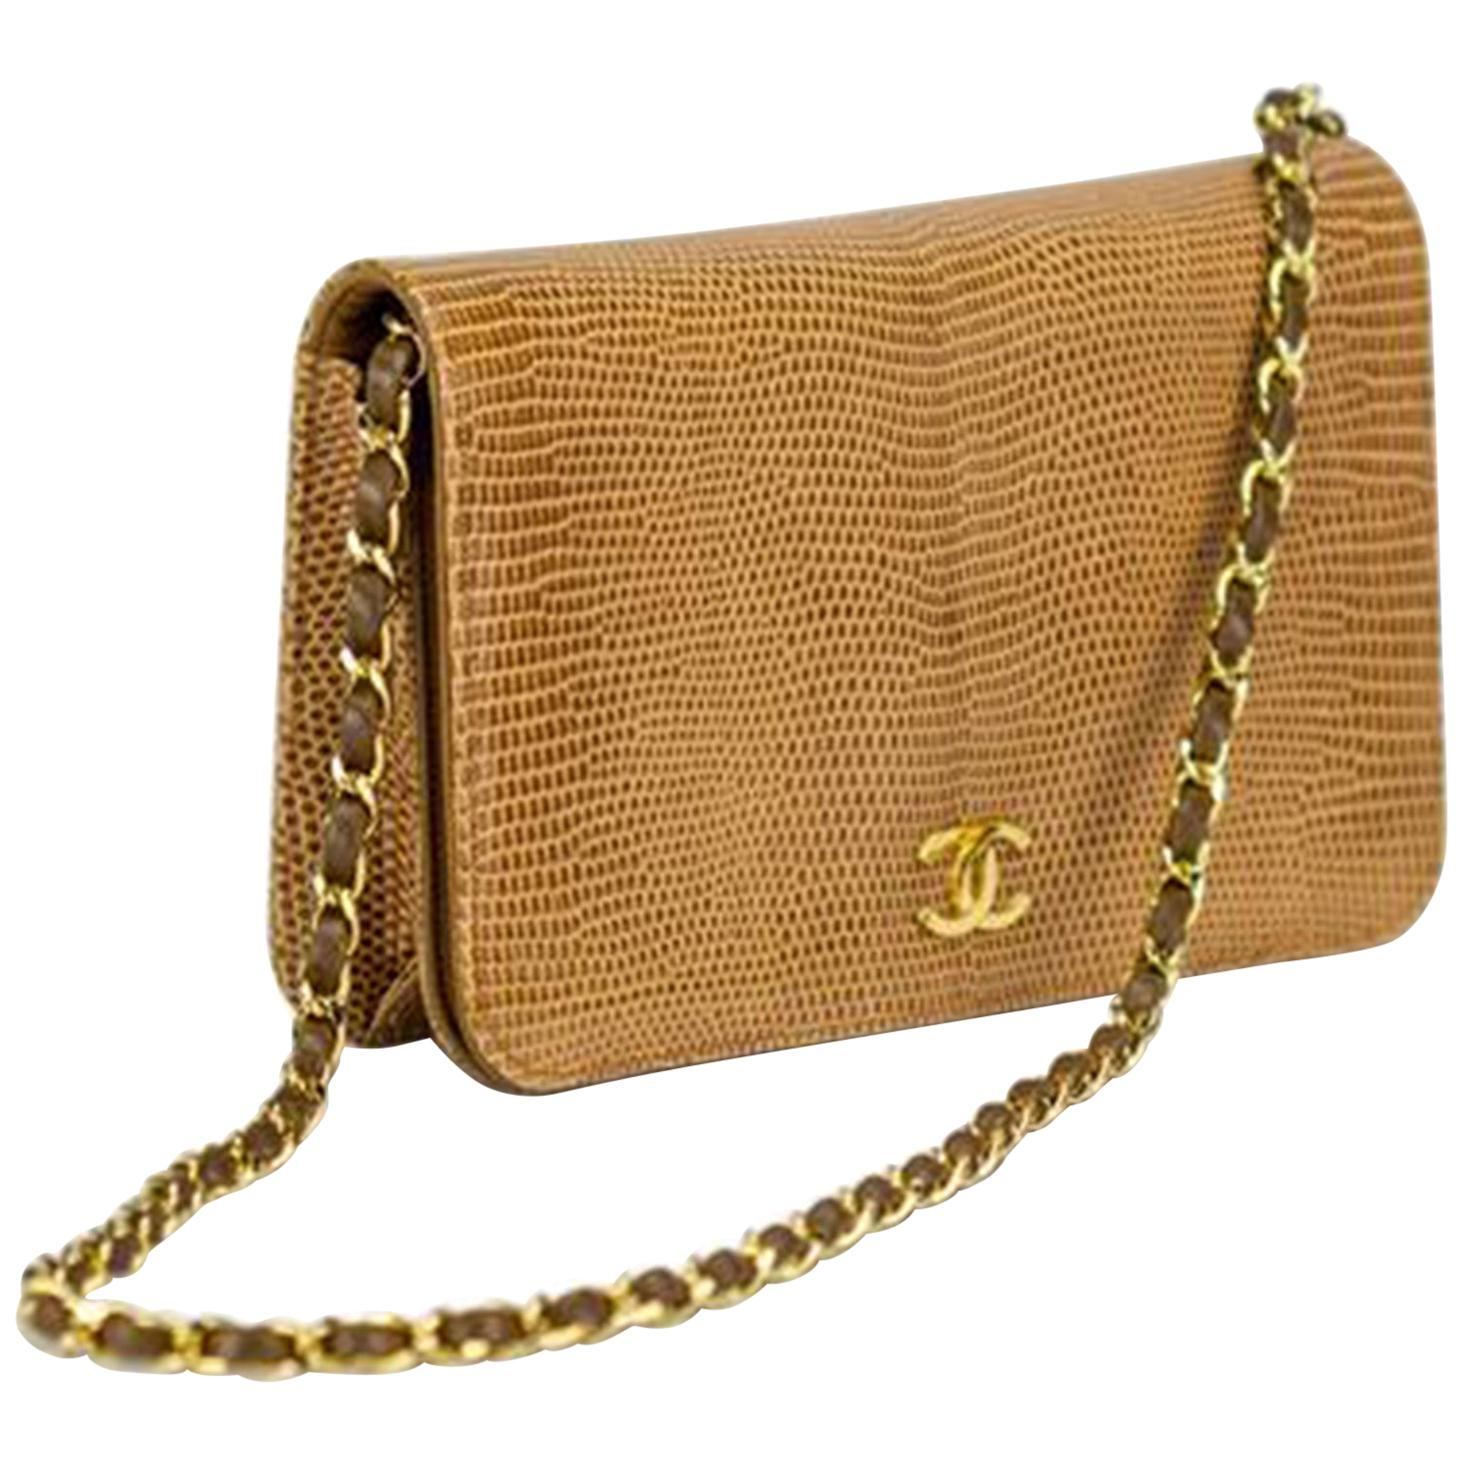 Chanel 80's Flap w Top Handle Clutch Exotic Convertible Caramel Lizard Skin Bag